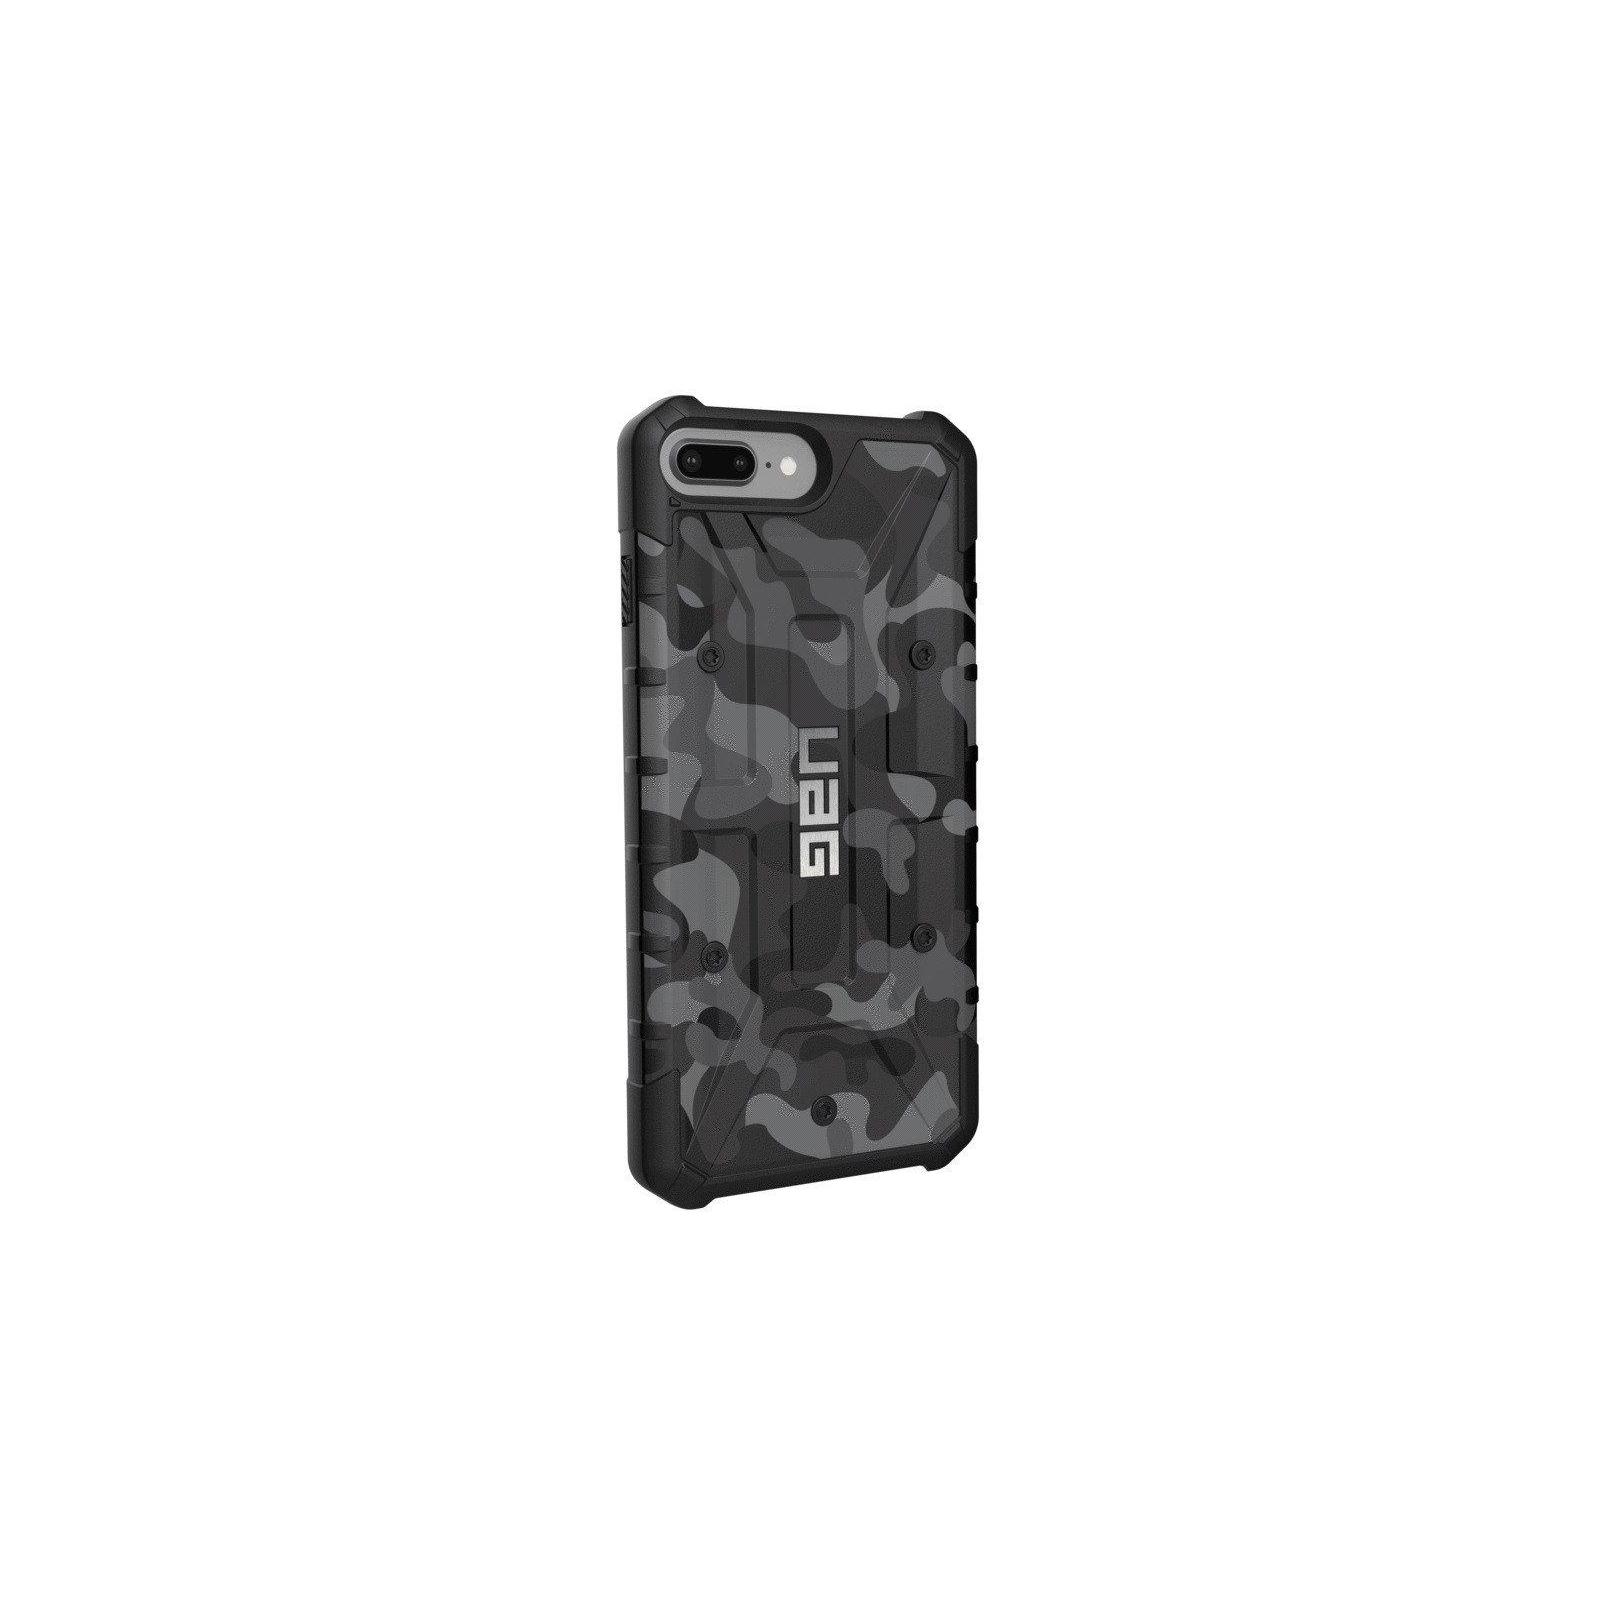 Чехол для моб. телефона Urban Armor Gear iPhone 8/7/6S Plus Pathfinder Camo Gray/Black (IPH8/7PLS-A-BC) изображение 4